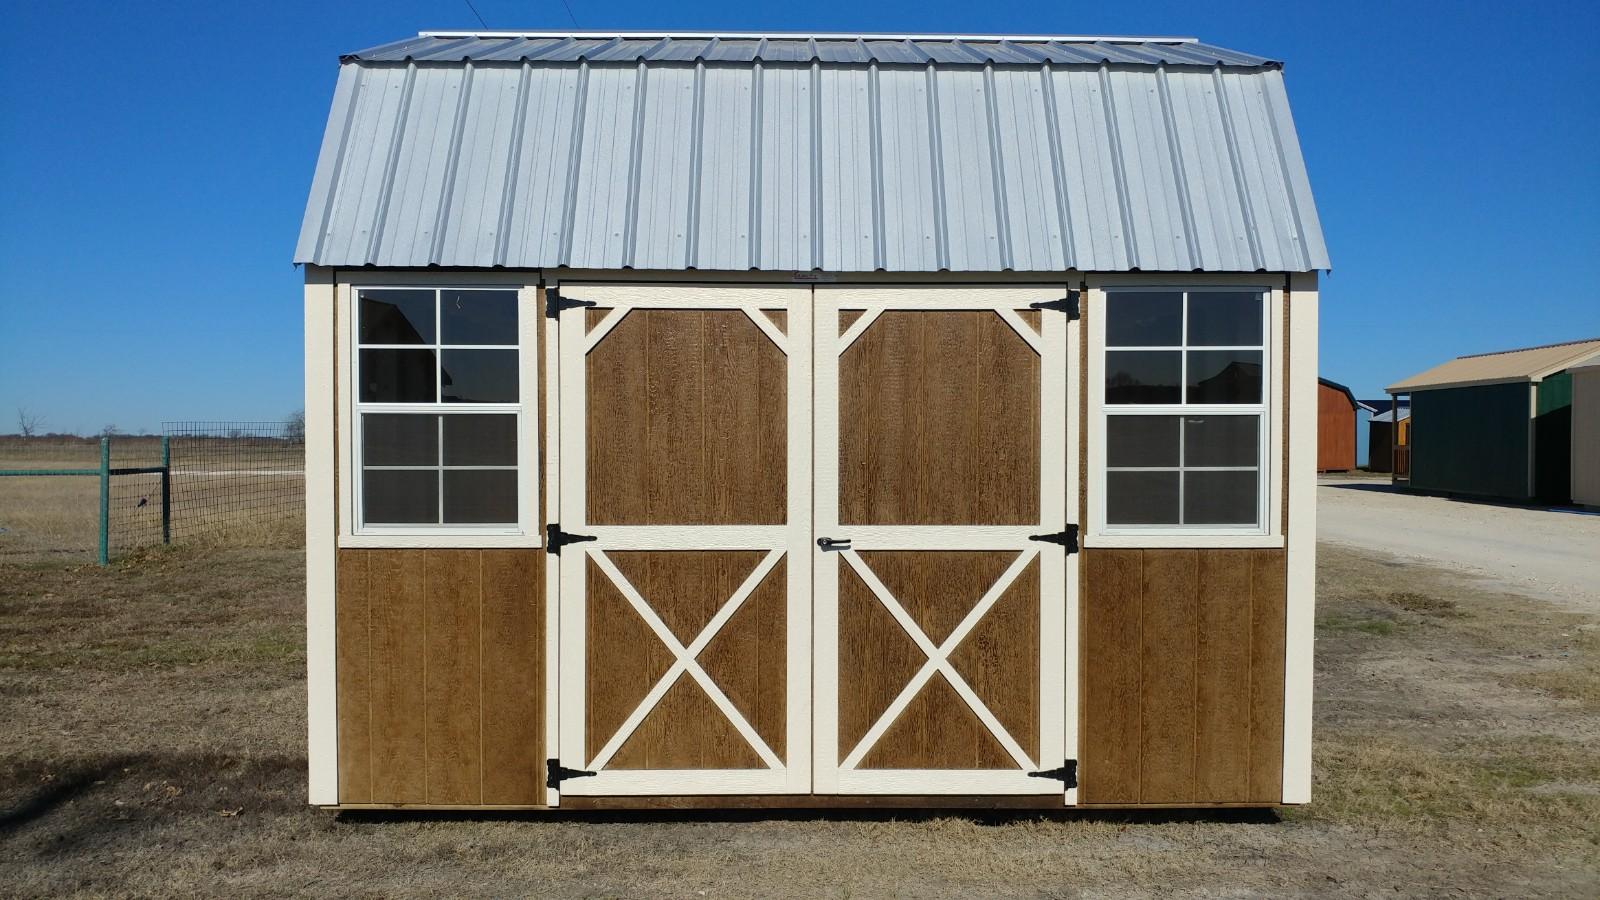 10x12 Lofted Barn (Chestnut Brown) Image